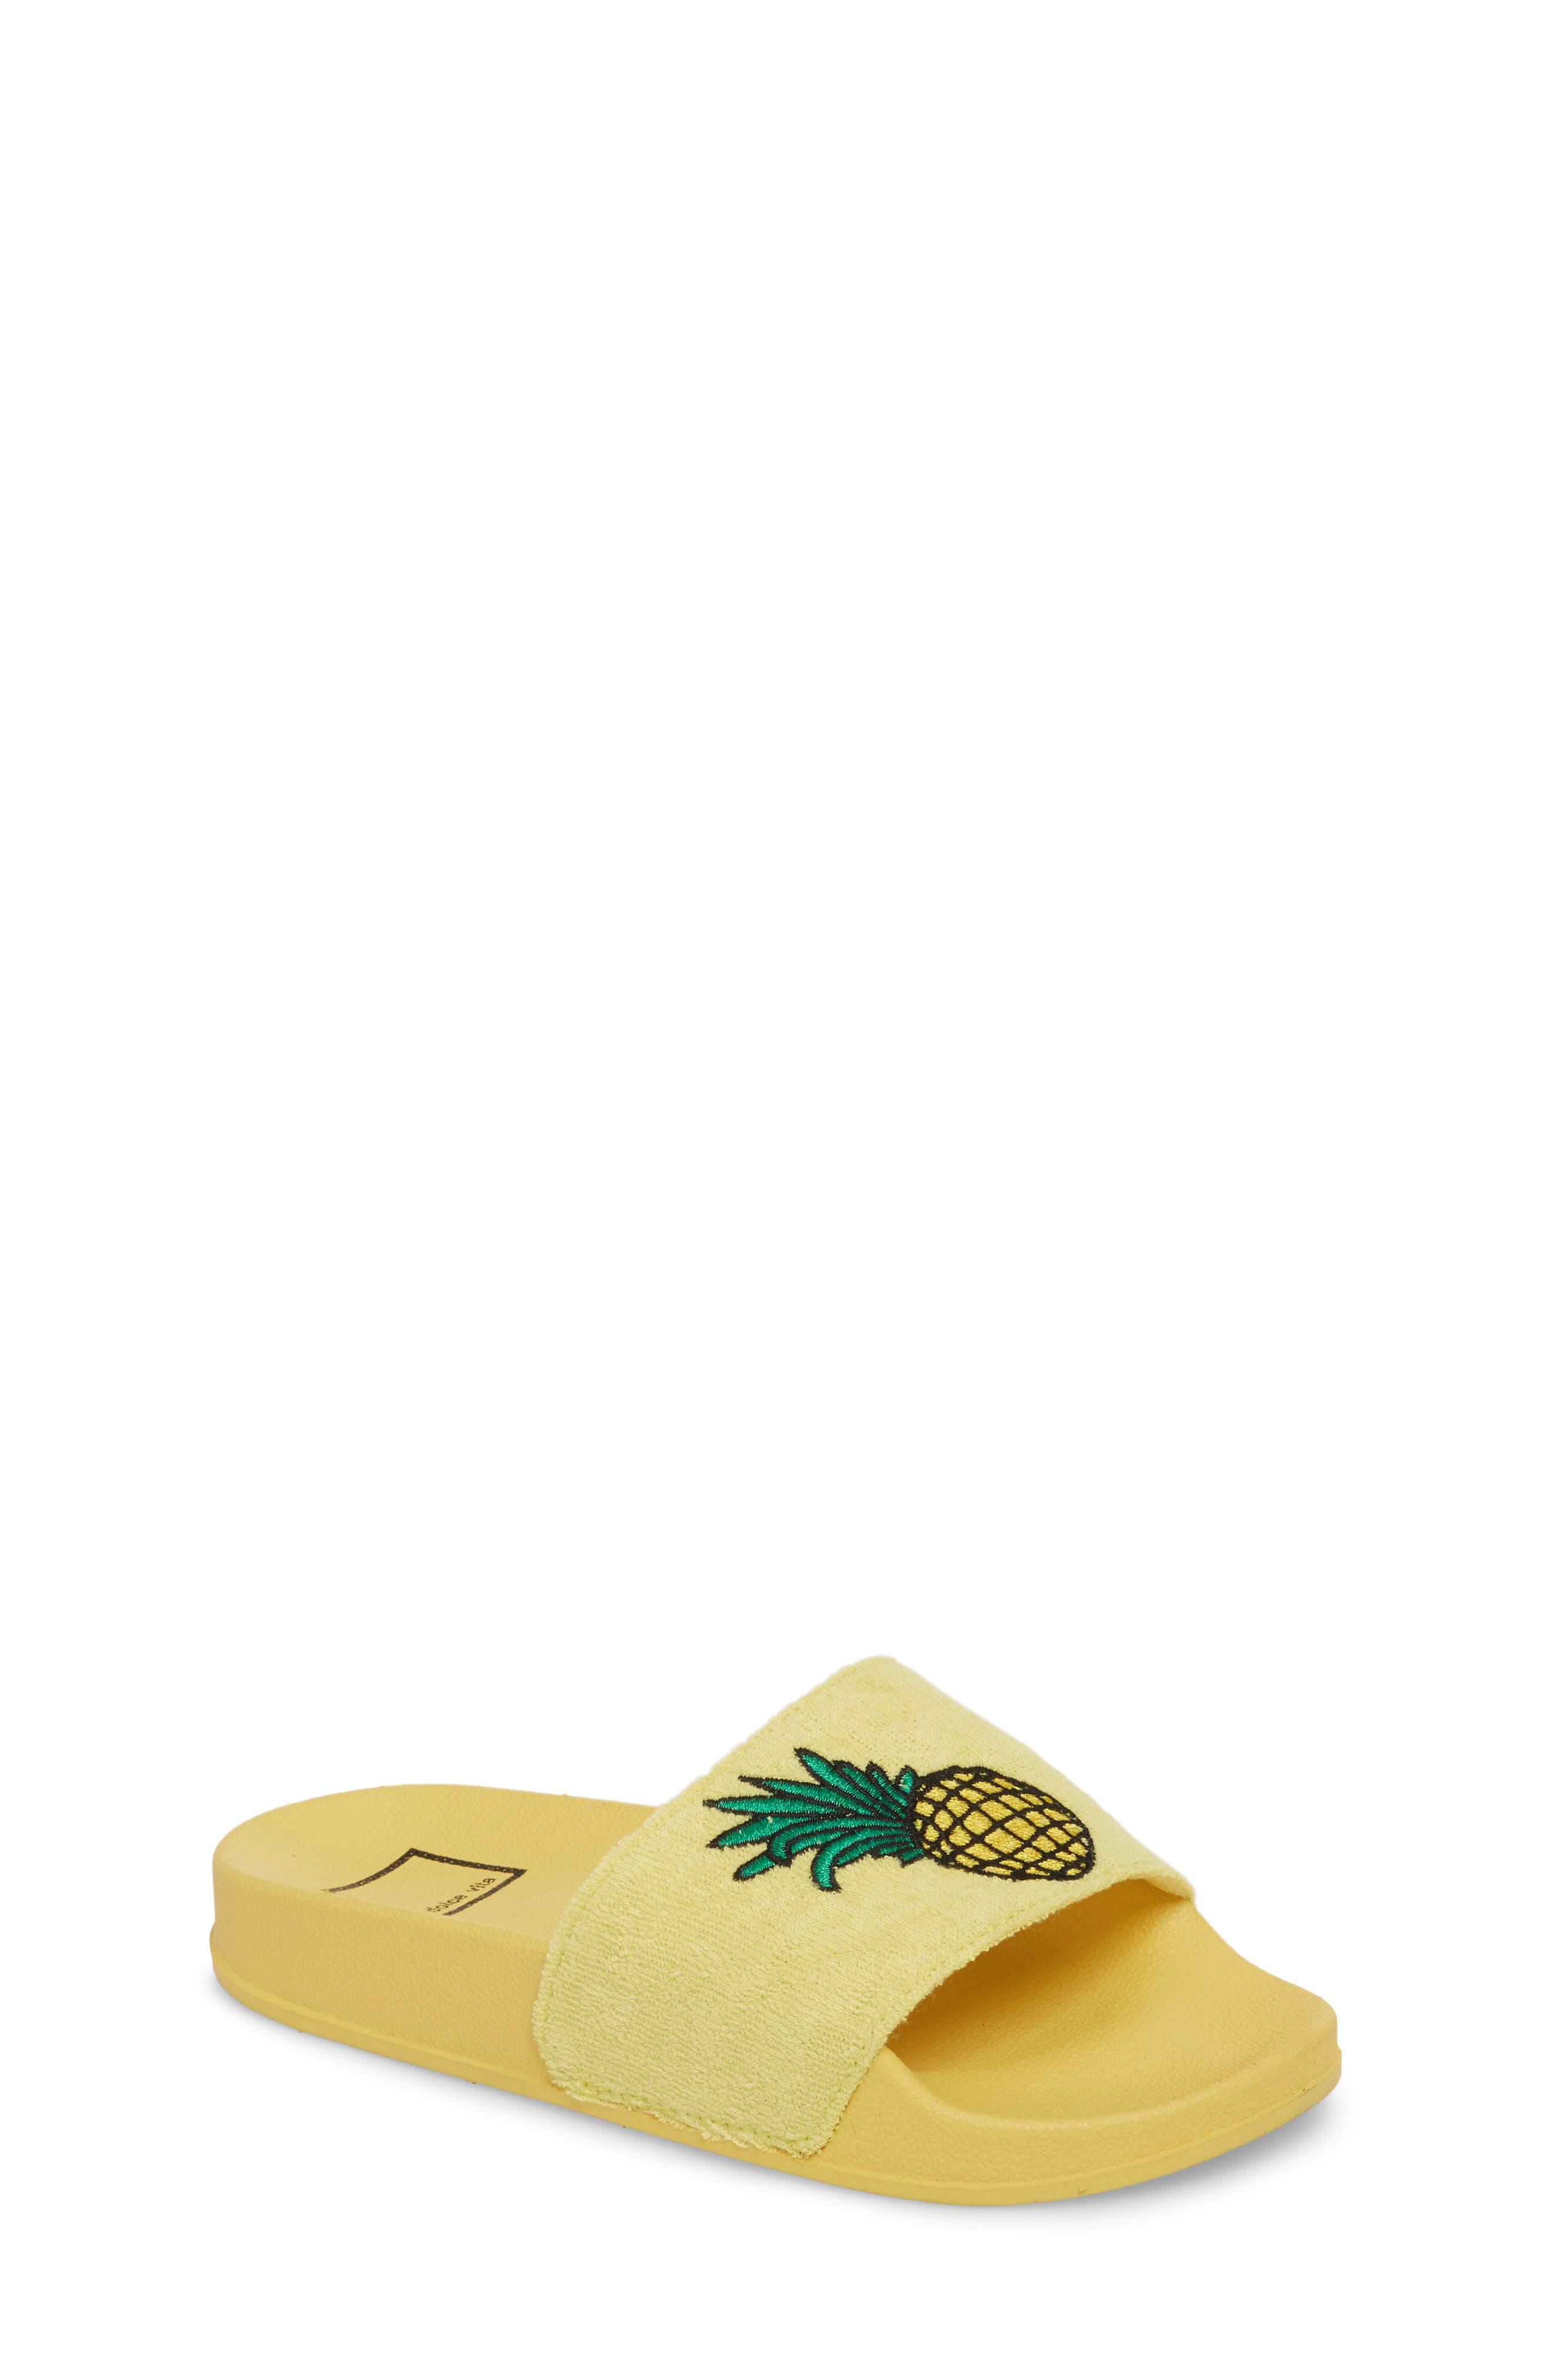 Dolce Vita Selby Fruit Embroidered Sport Slide (Toddler, Little Kid & Big Kid)